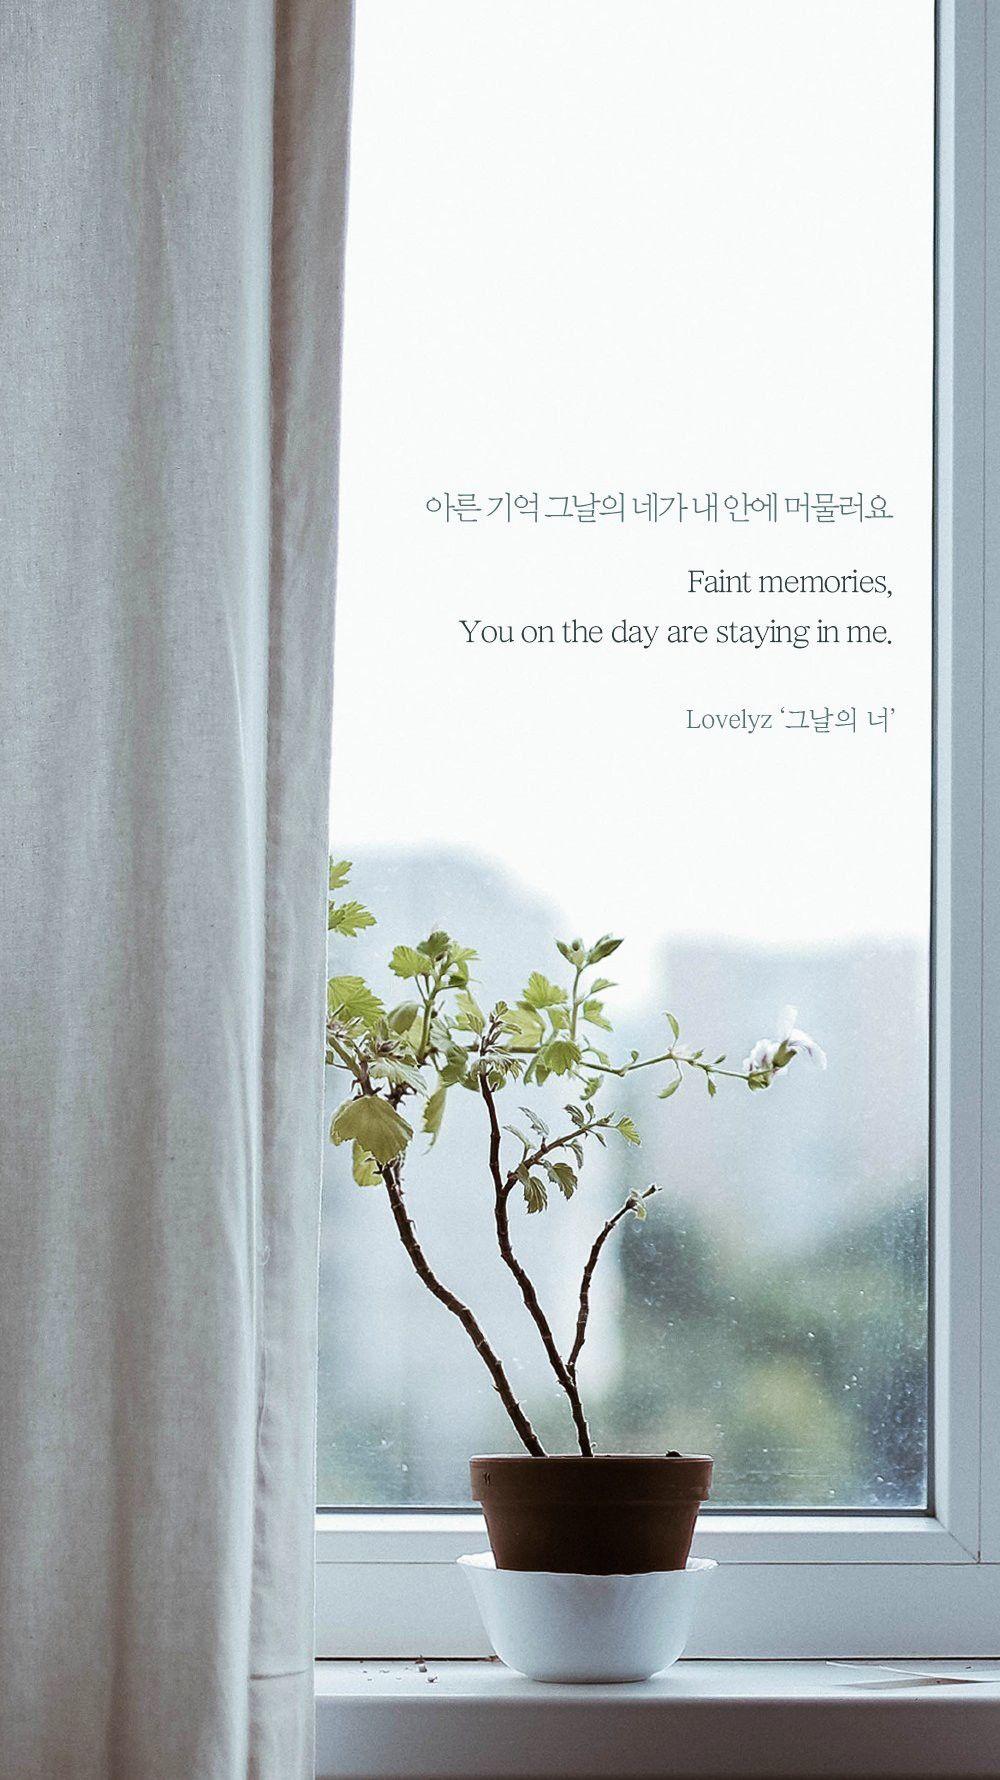 Pin oleh Thu Huyền di quotes kpop Kutipan lirik, Lirik